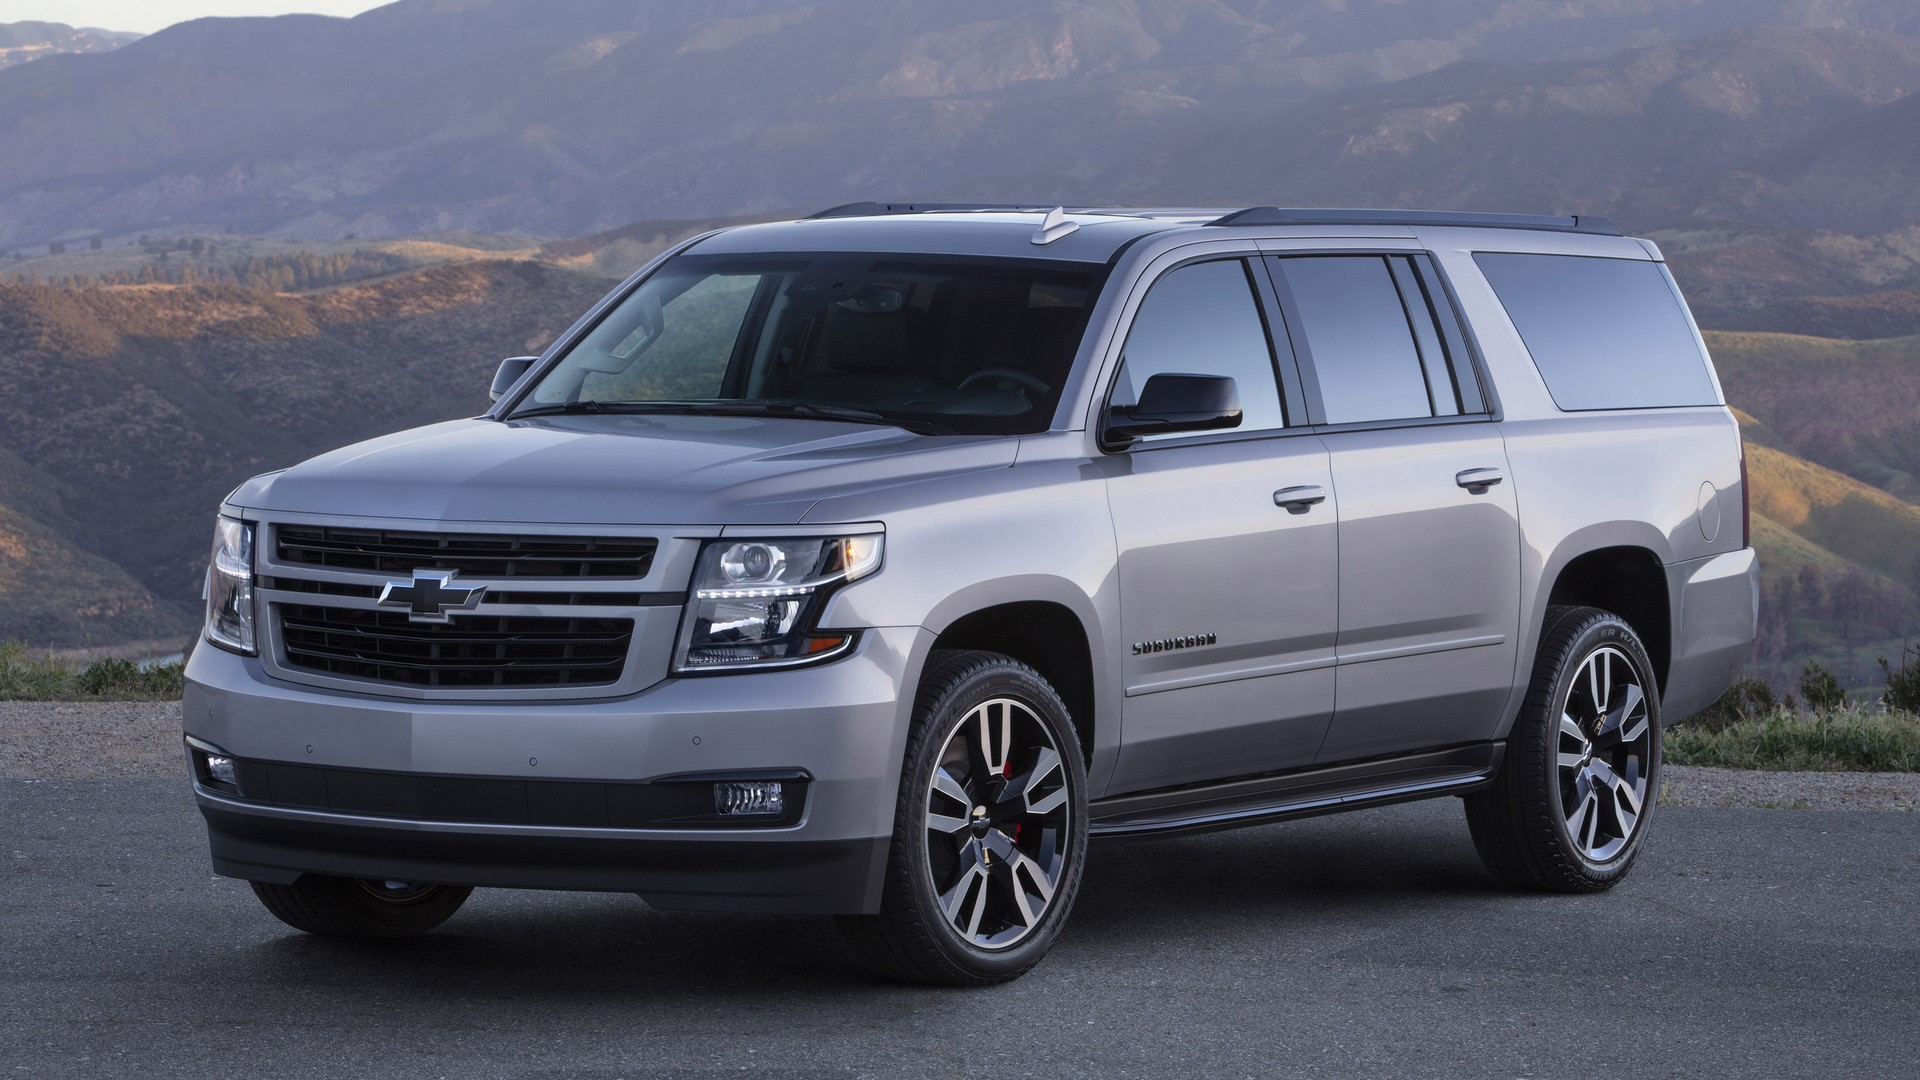 Chevrolet Suburban RST 2019 (3)